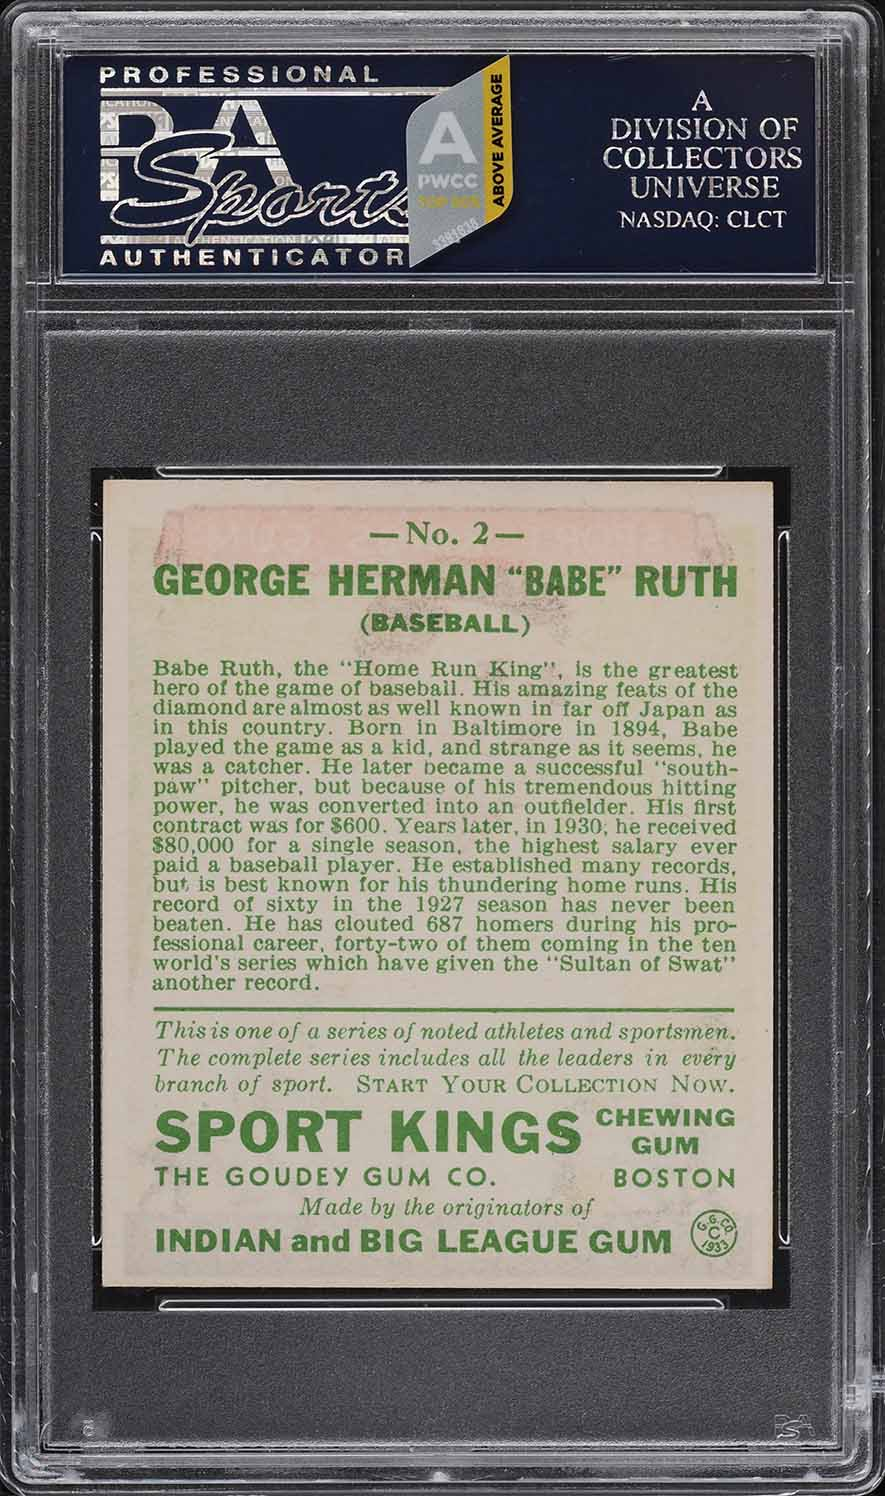 1933 Goudey Sport Kings Babe Ruth #2 PSA 7 NRMT (PWCC-A) - Image 2